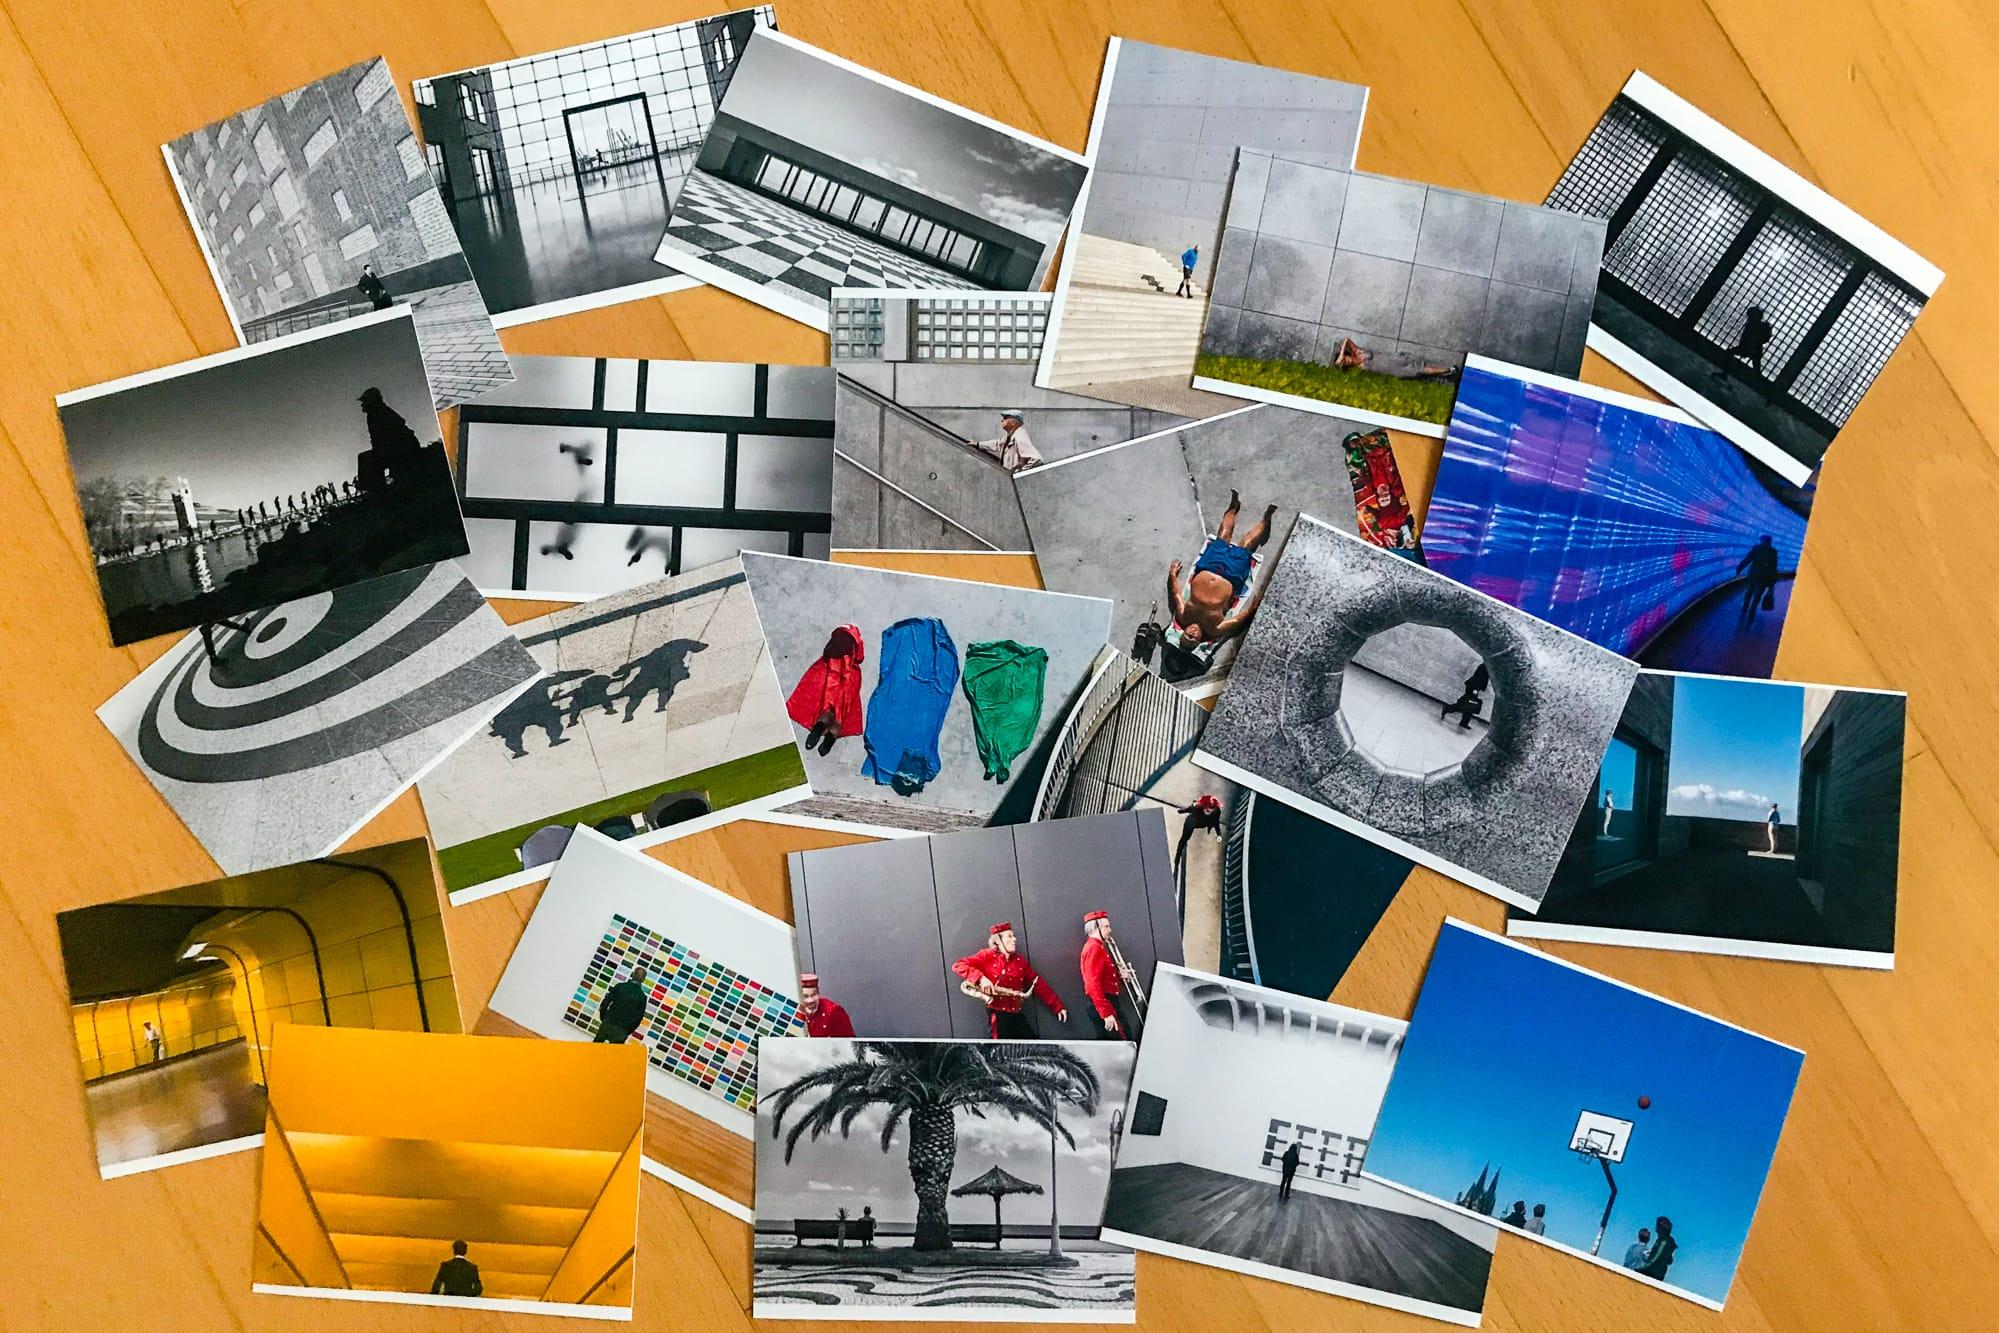 querformat-fotografie - Achim Katzberg - querformat-fotografie_achtzehn_aus_2018